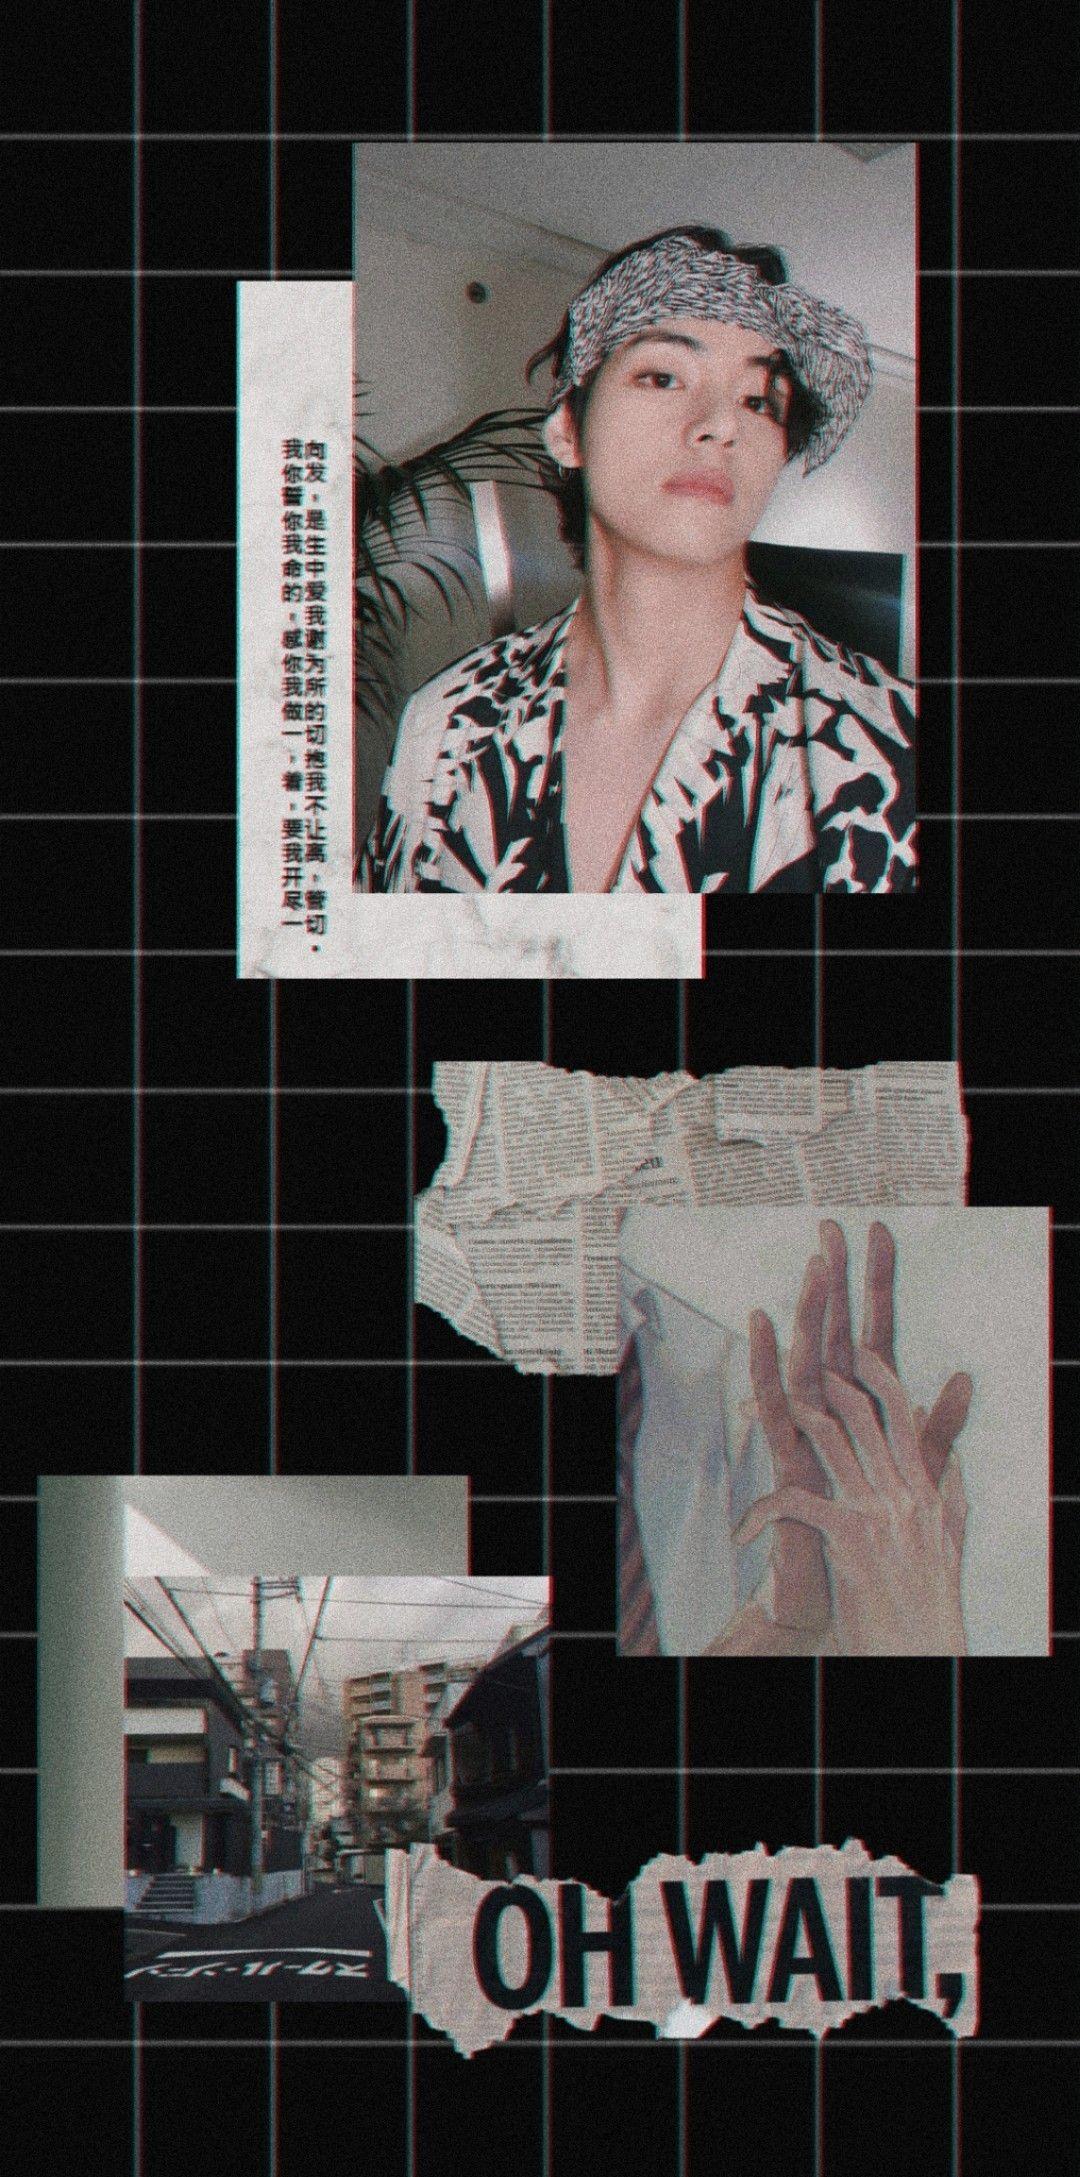 Taehyung Aesthetic Wallpaper Kim Taehyung Wallpaper Bts Laptop Wallpaper Wallpaper Wa Wallpaper wa bts v